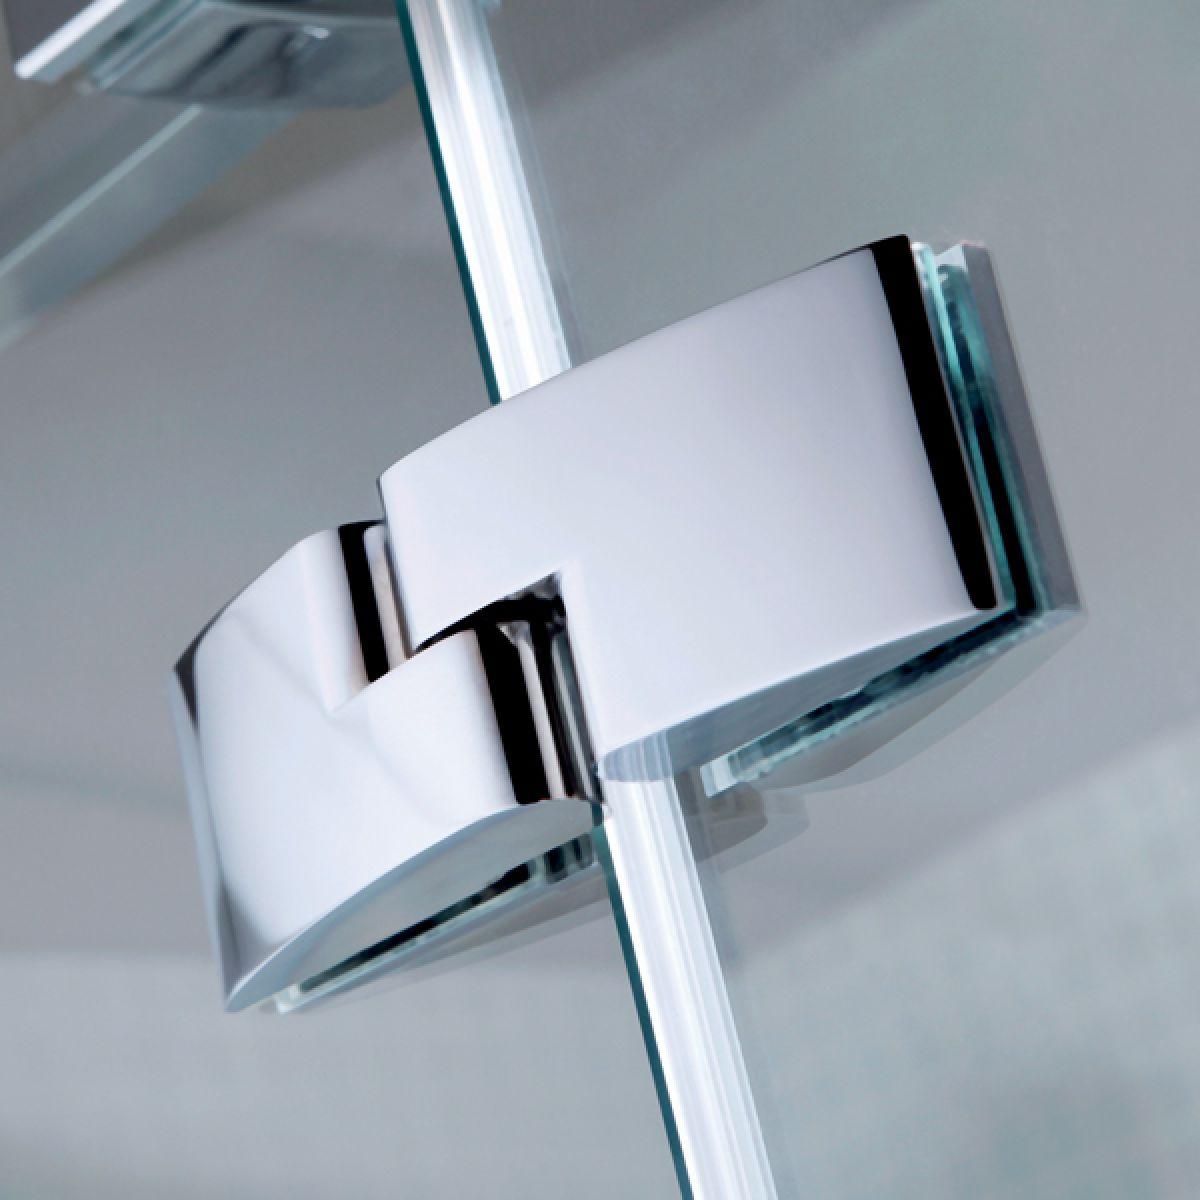 Prestige2 Frameless Single Door Quadrant Shower Enclosure Detail 2